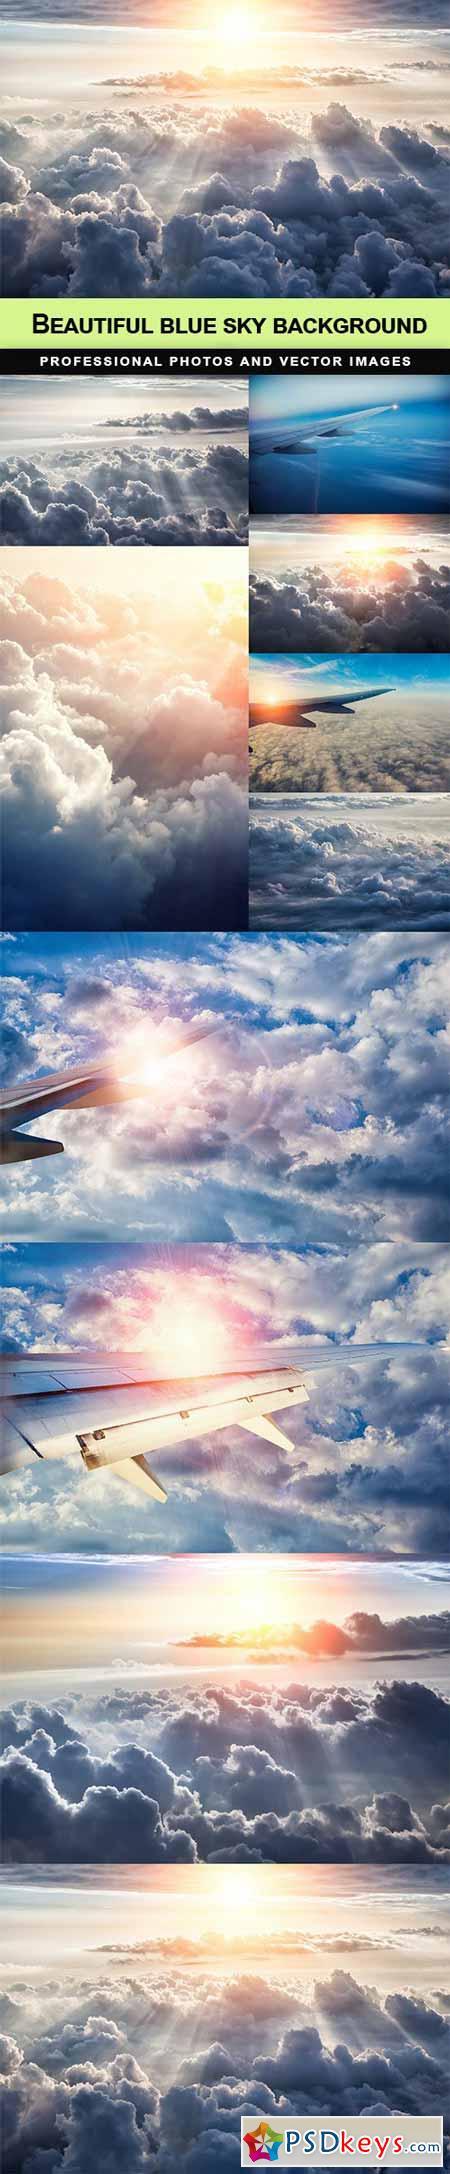 Beautiful blue sky background - 10 UHQ JPEG